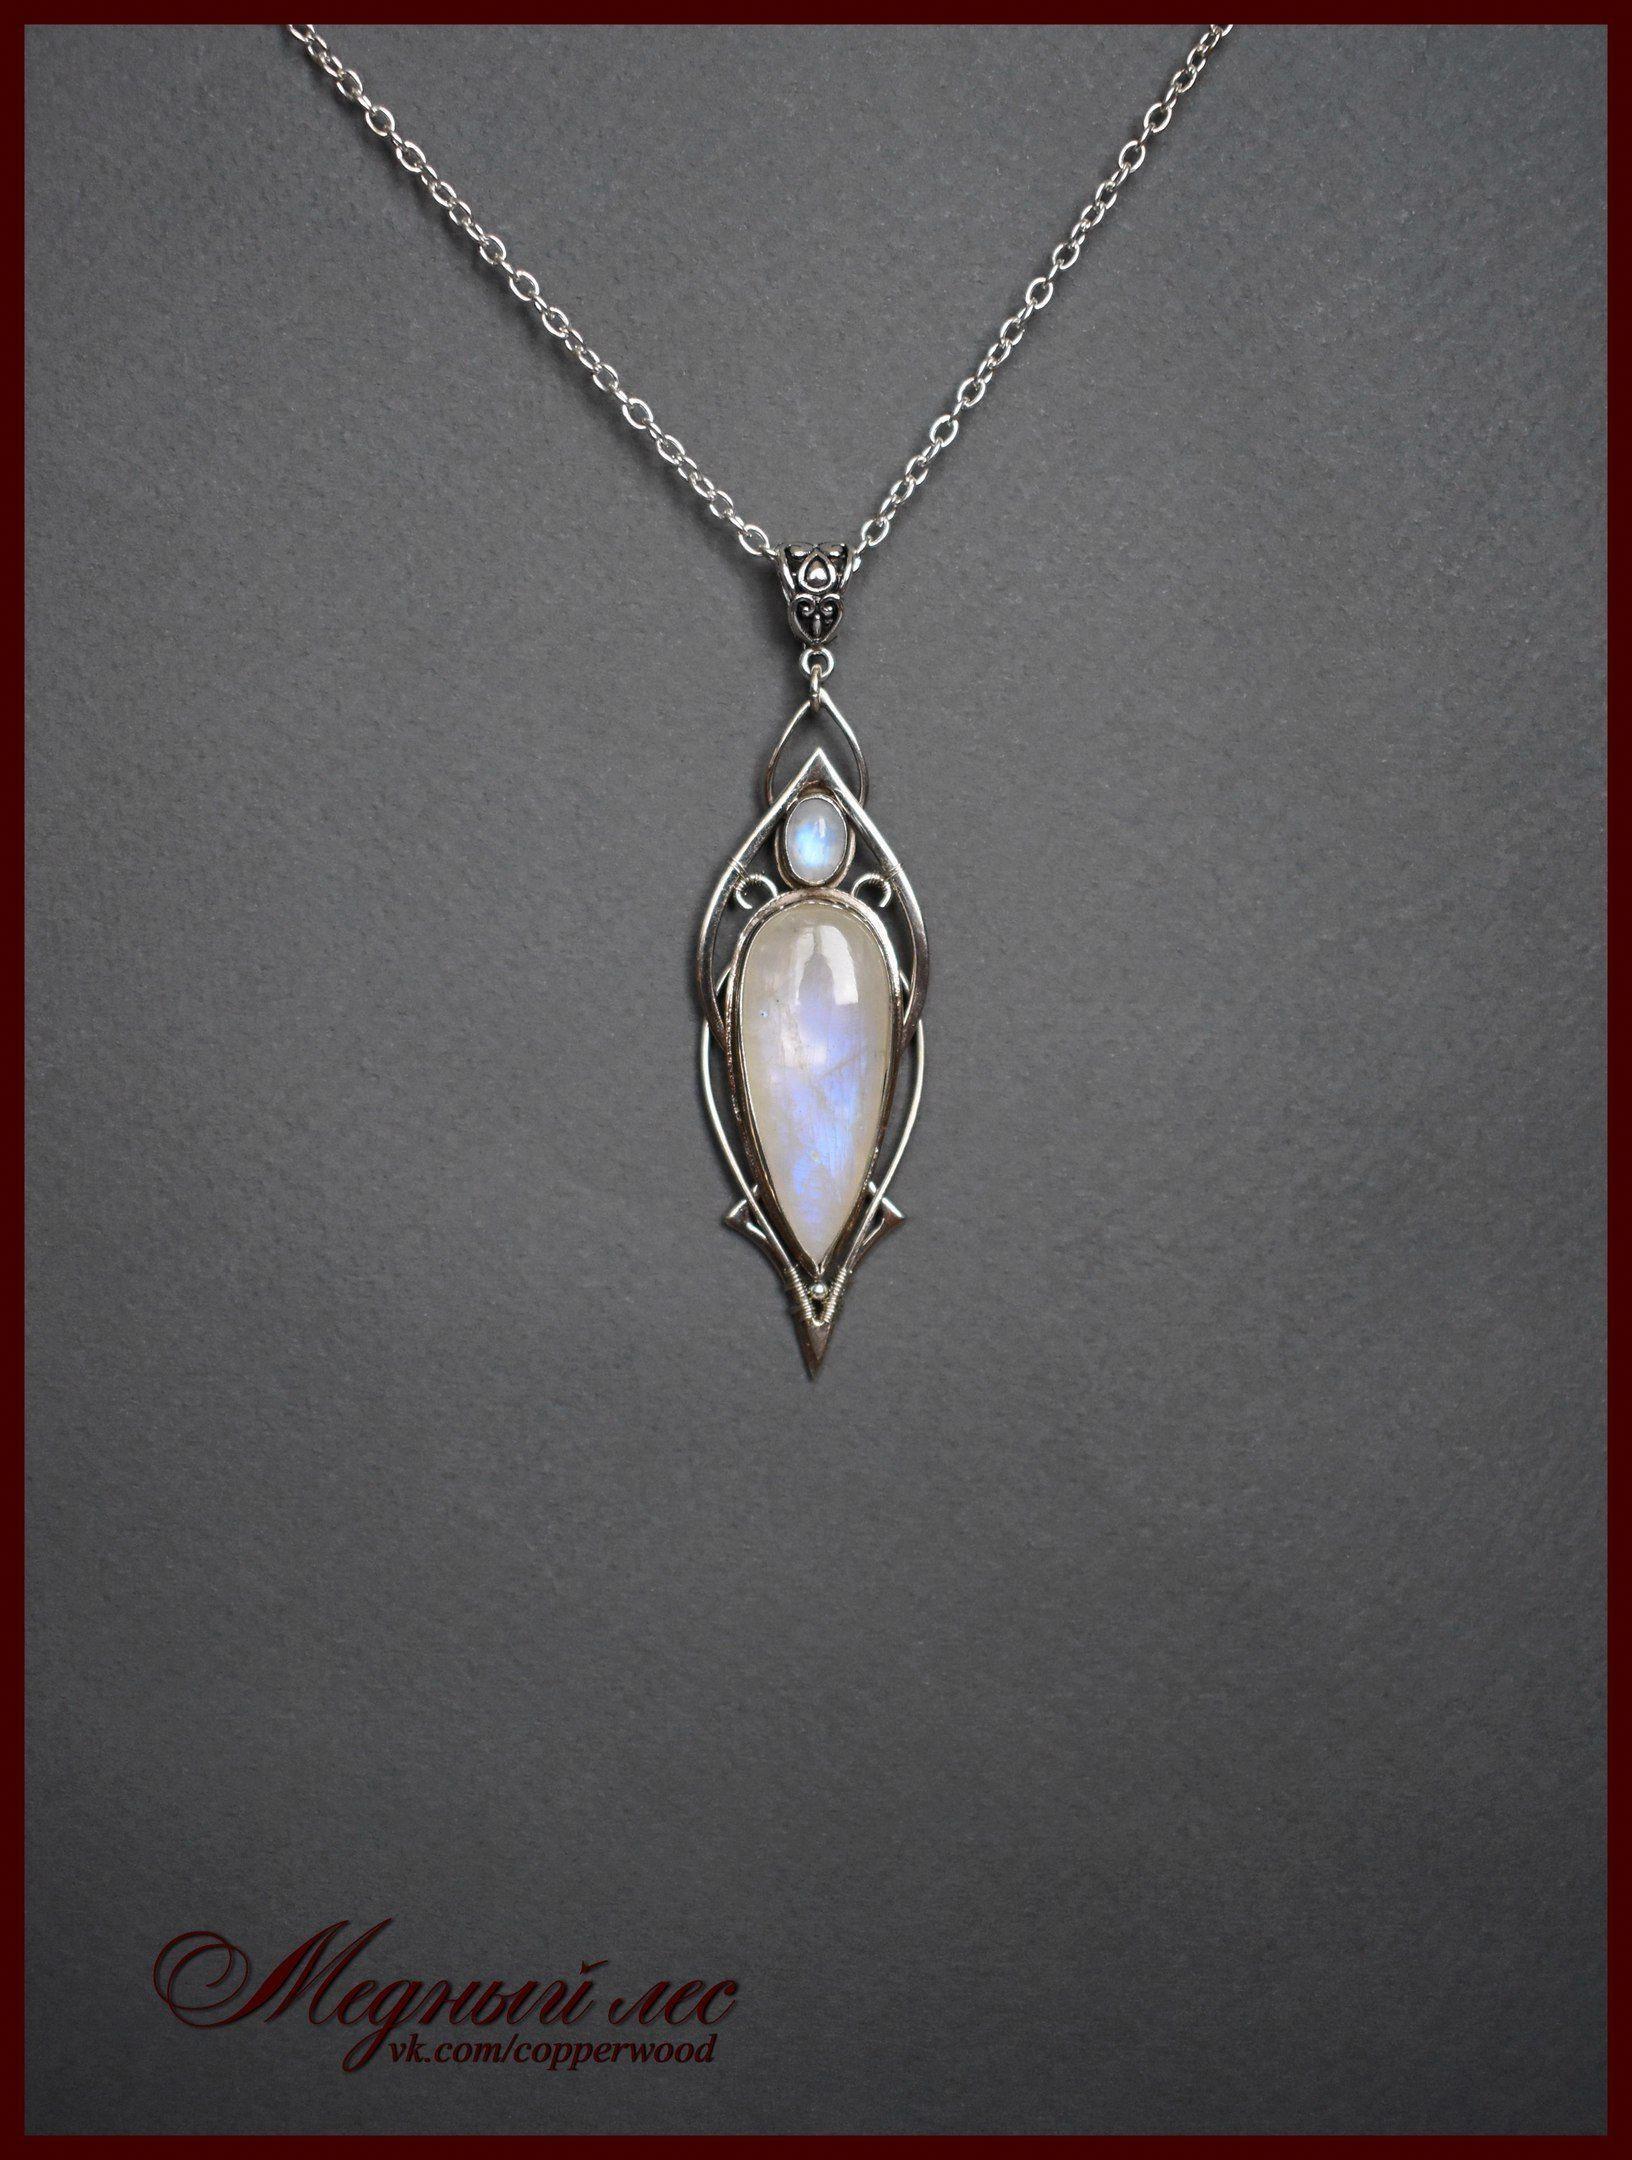 Silpadasterling Silver Spheres Wires Earrings Elven Jewelry Jewelry Silver Wedding Jewelry